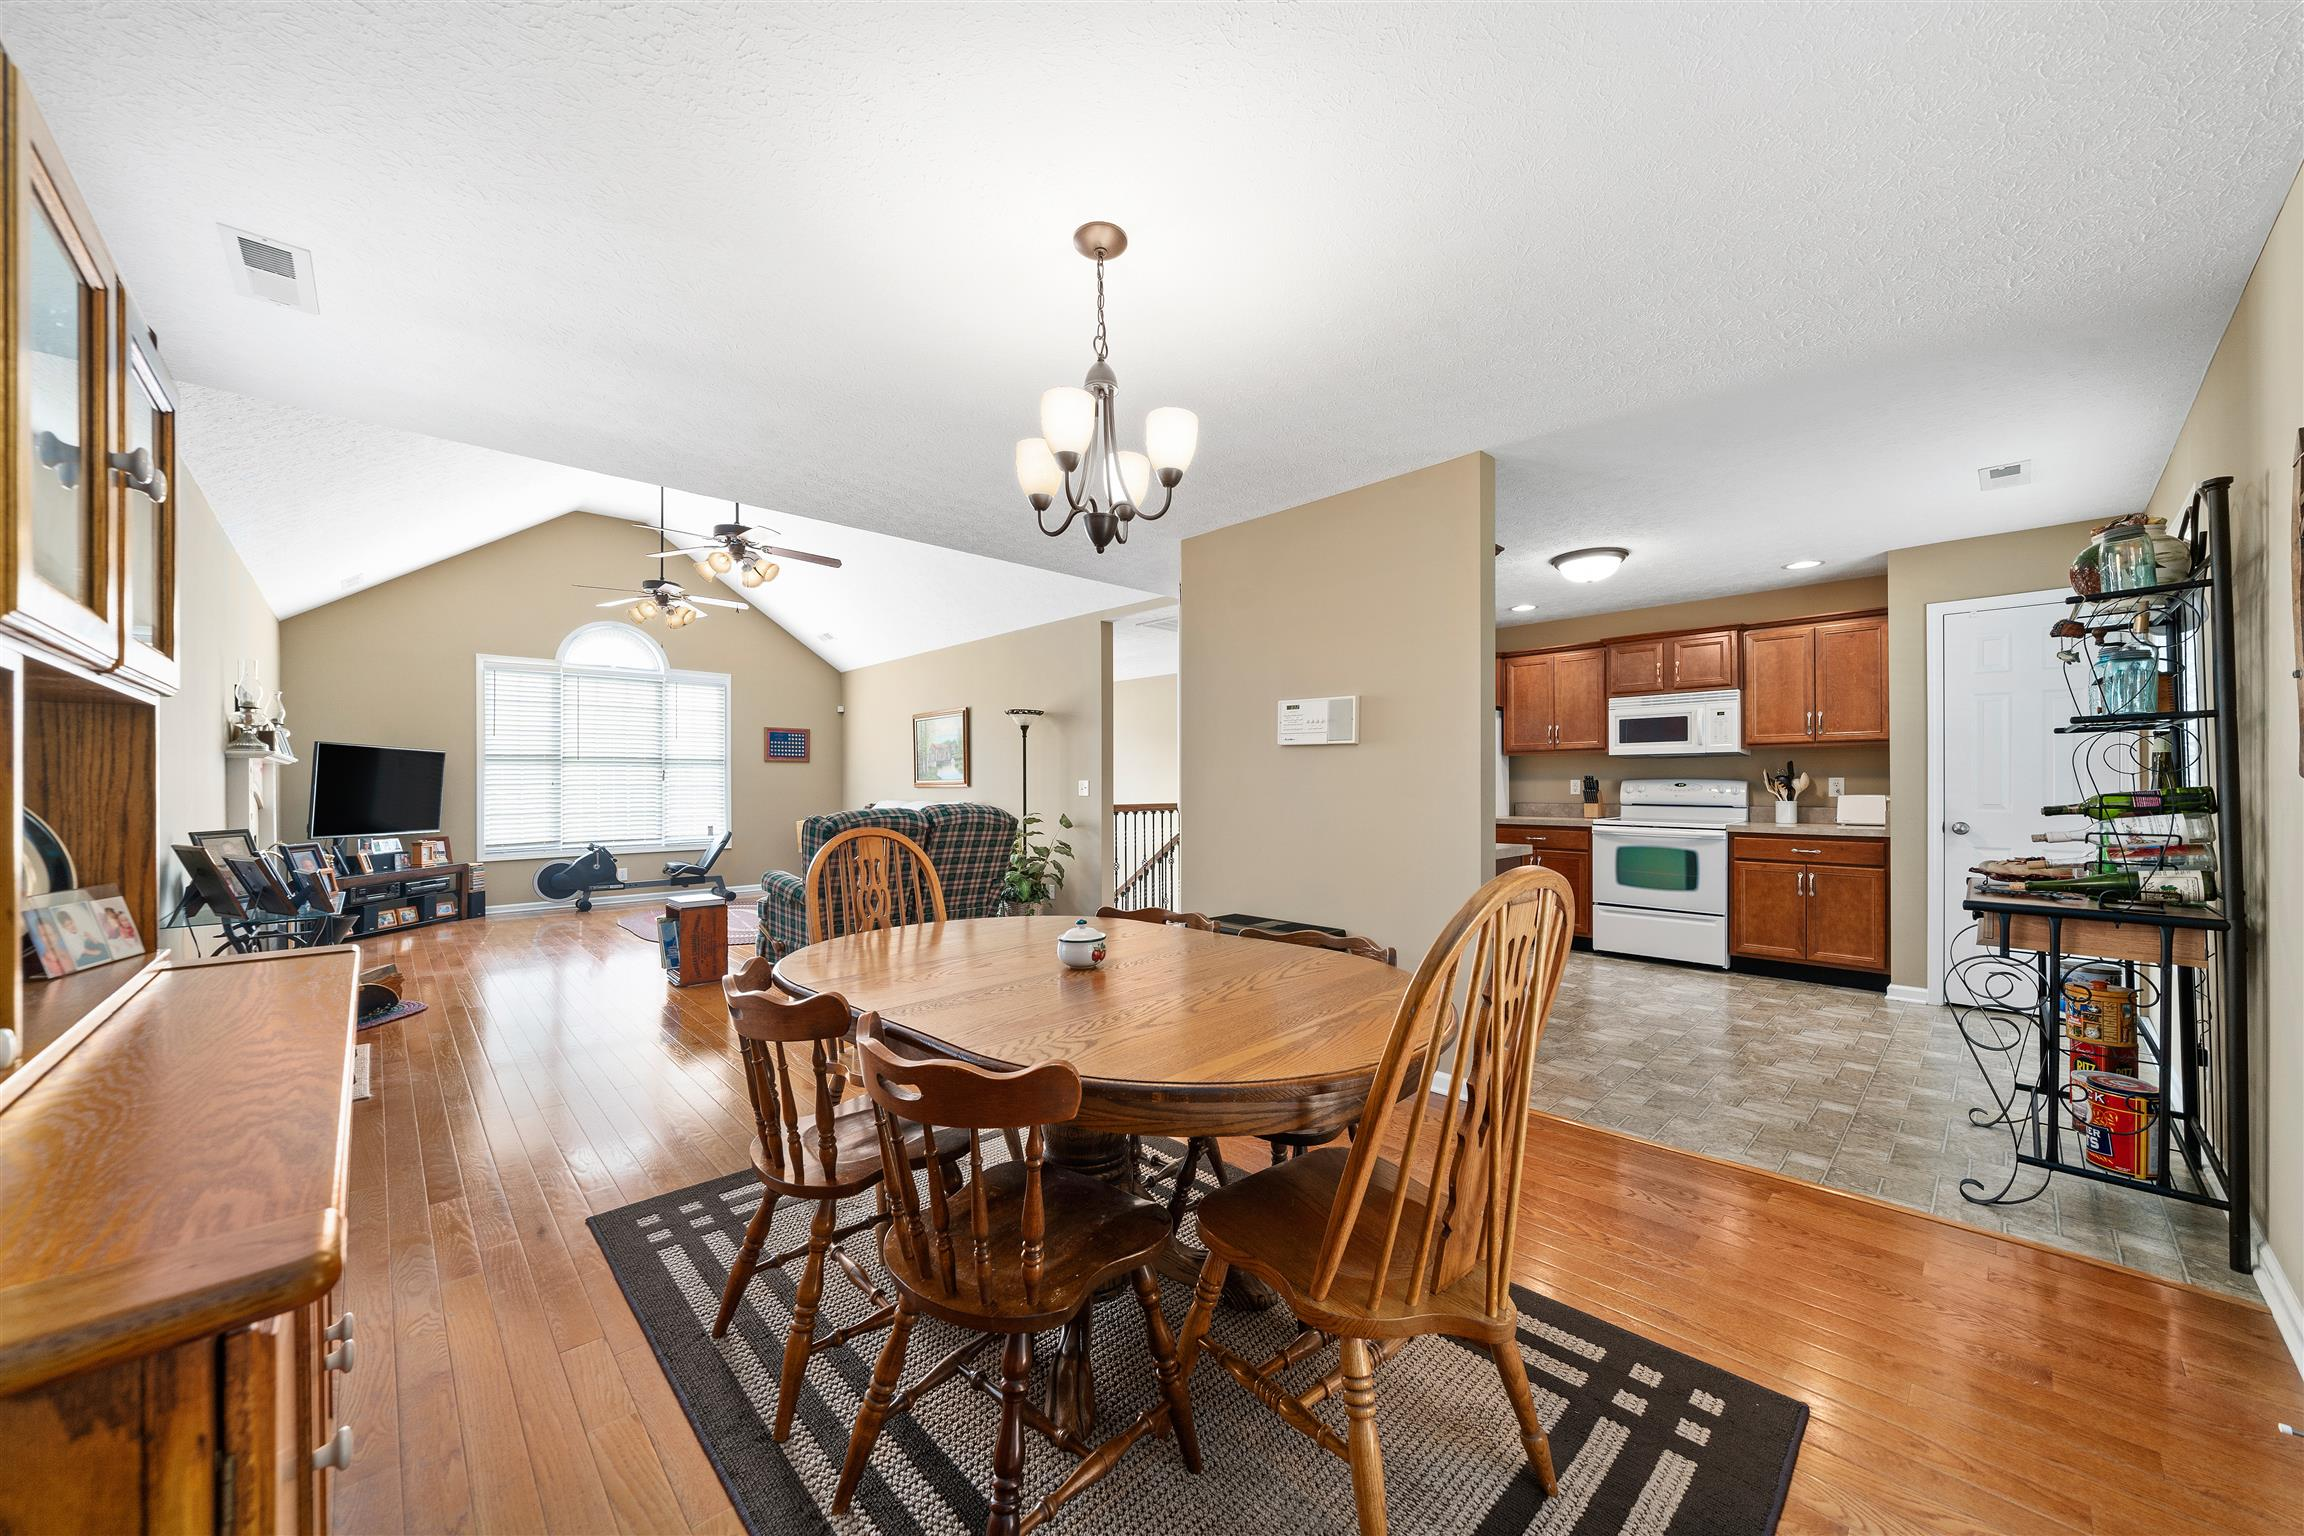 924 Excalibur Dr, Clarksville, TN 37040 - Clarksville, TN real estate listing